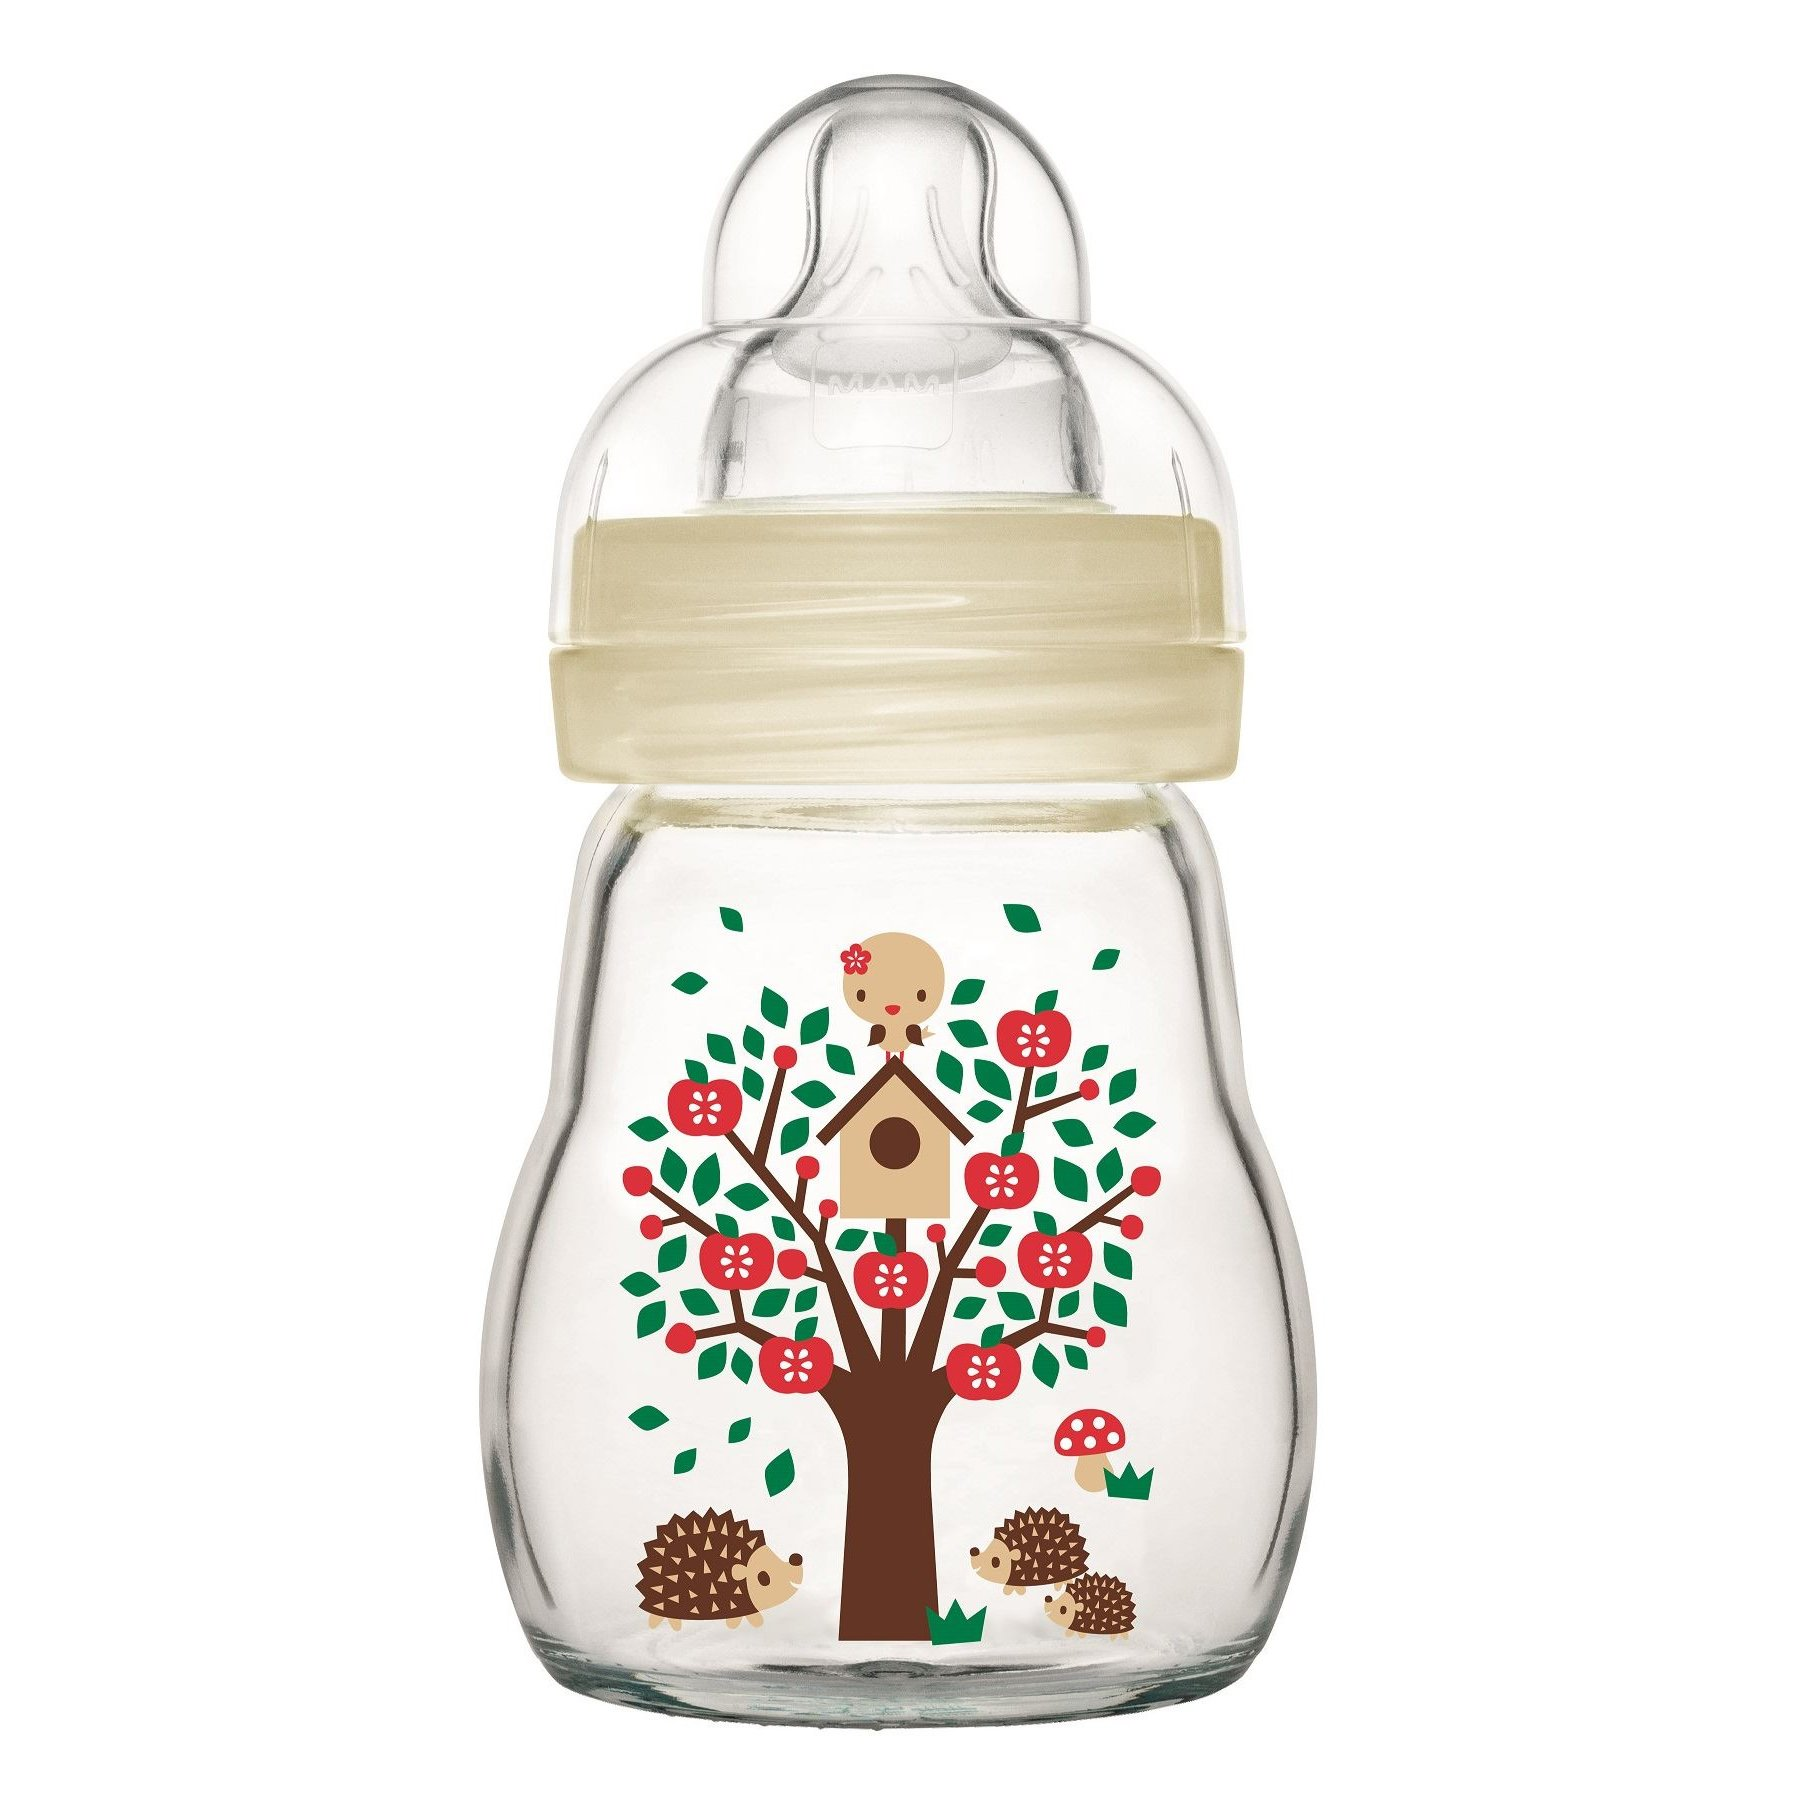 Mam Feel Good Κωδ 370S1 Γυάλινο Μπιμπερό με Θηλή Σιλικόνης από 0+ Μηνών & Δώρο μια Επιπλέον Θηλή Σιλικόνης 2+ Μηνών, 170ml – άσπρο